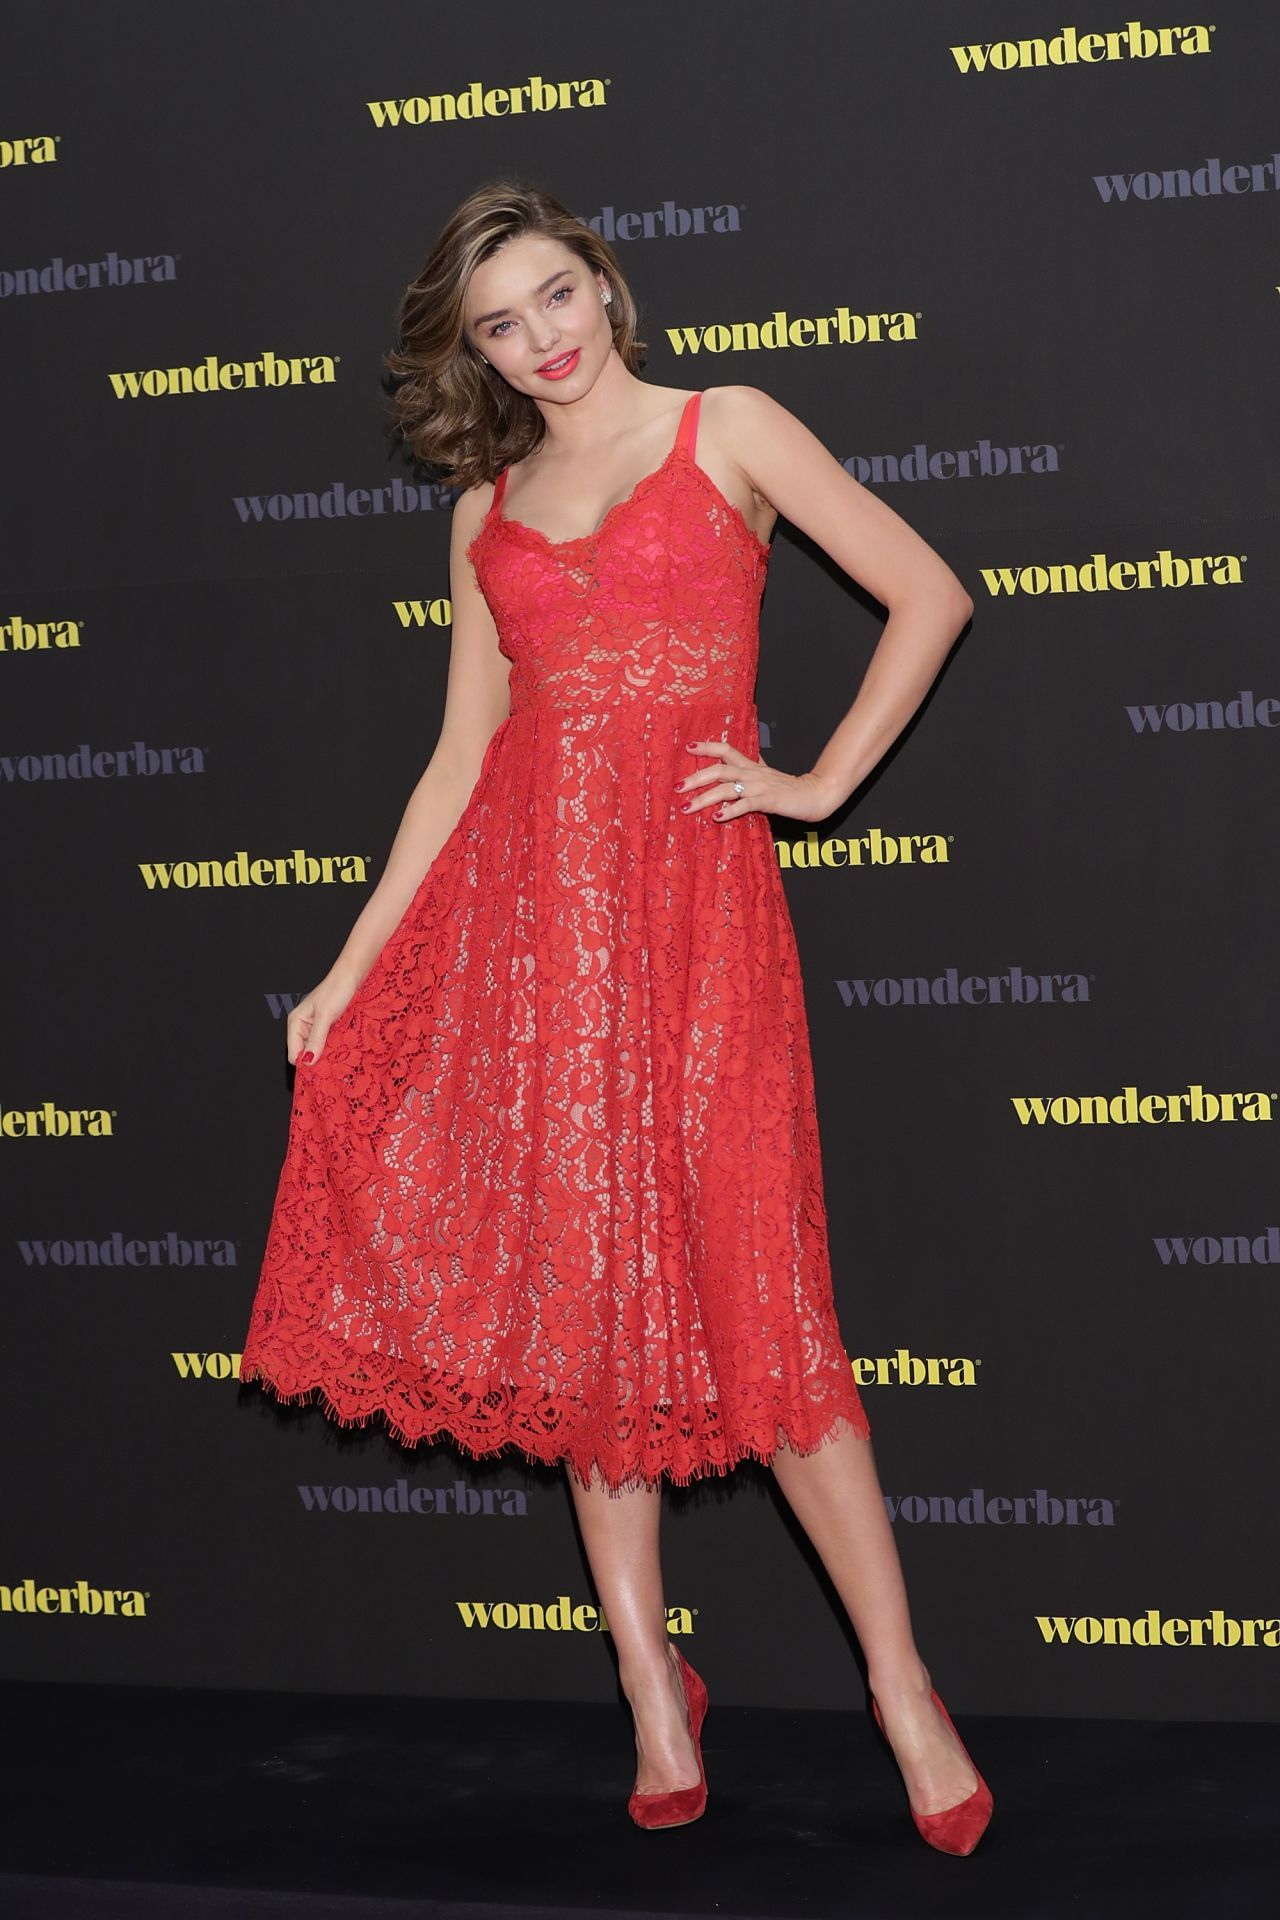 Miranda Kerr at The Great Wonderbra Event in Seoul, South Korea